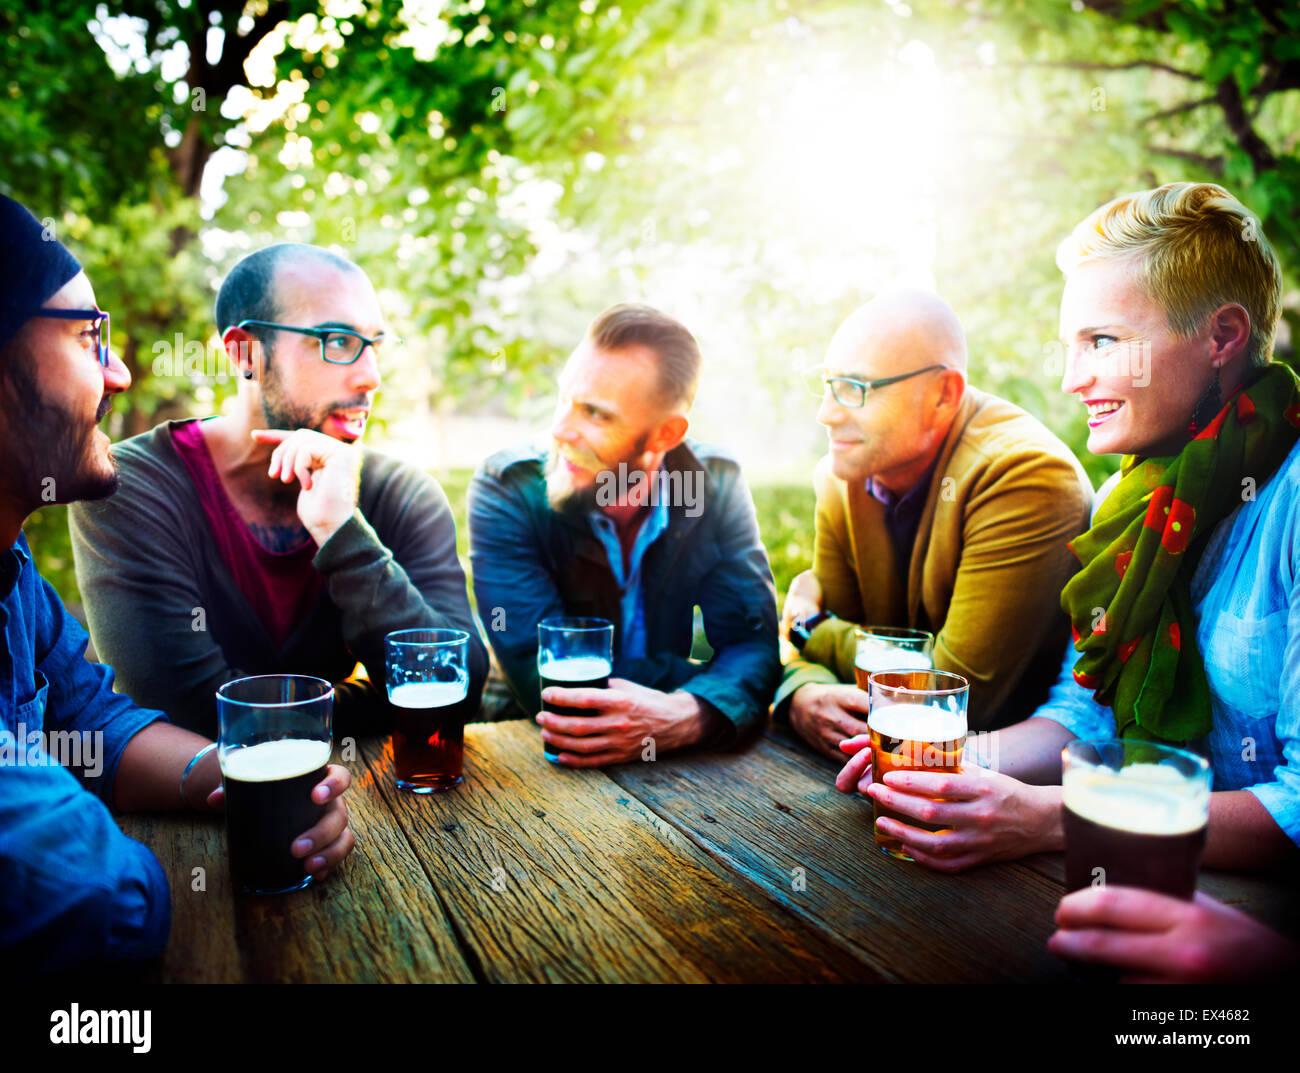 Menschen Bier trinkenden Partei Freundschaft Konzept Stockbild